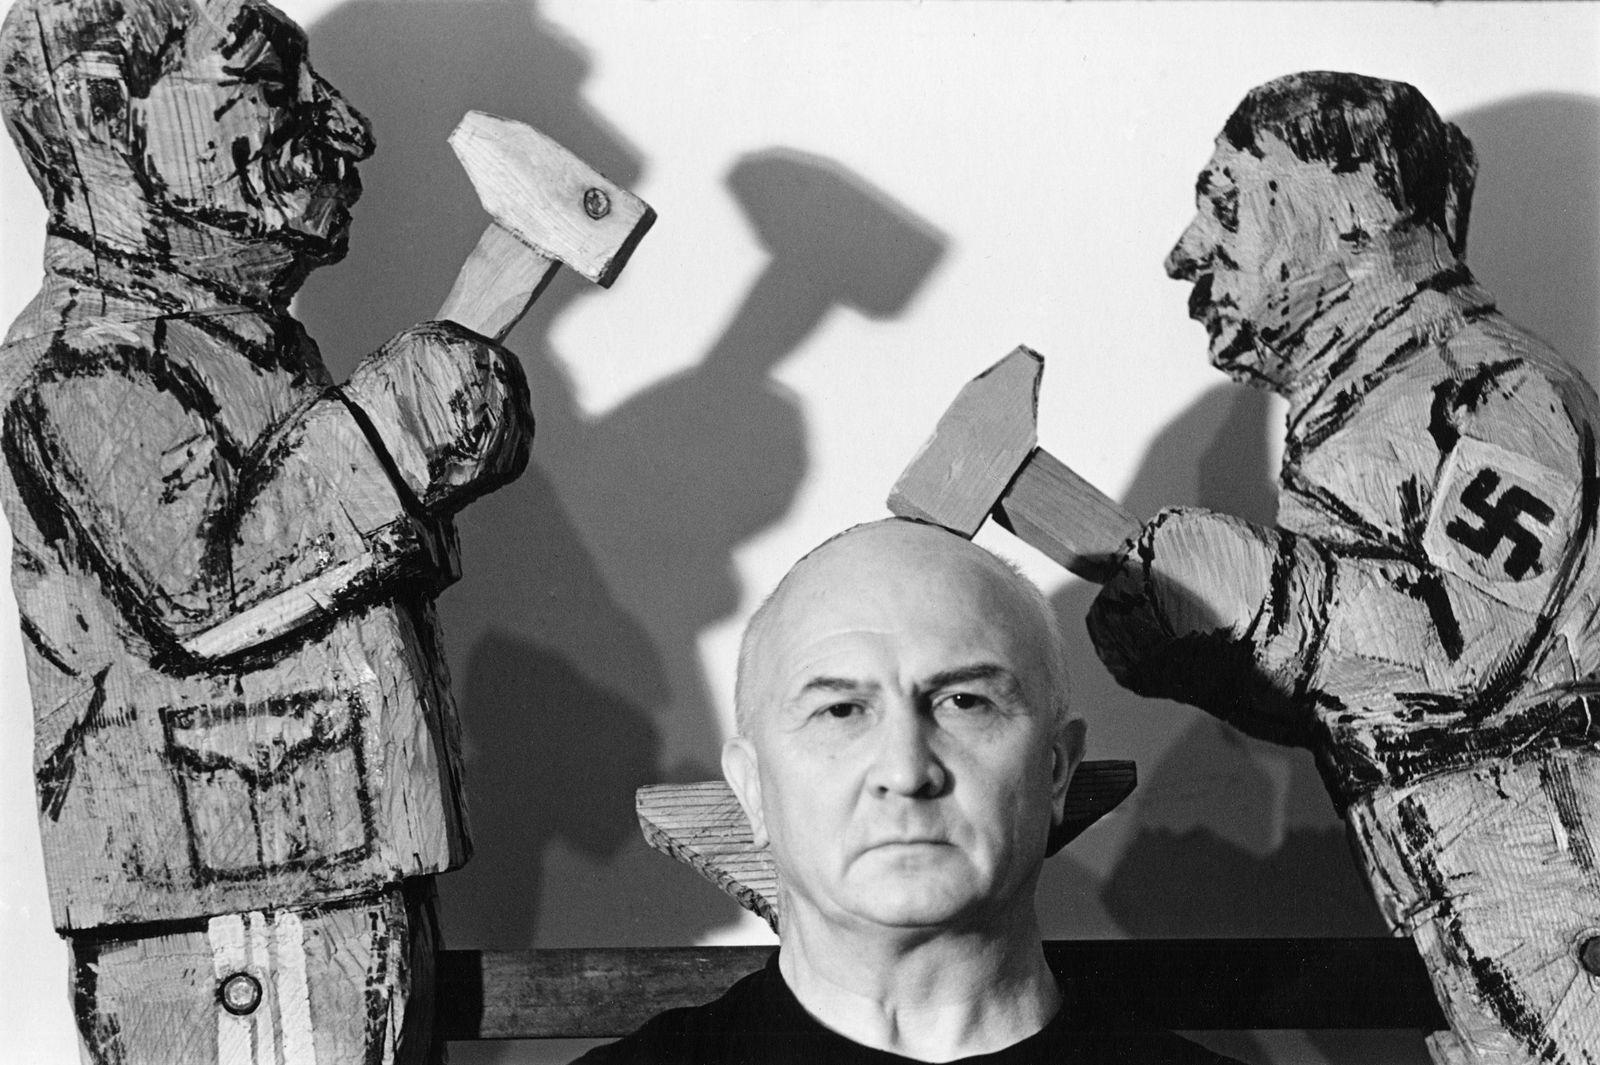 Сергей Борисов. portrait. Untittled